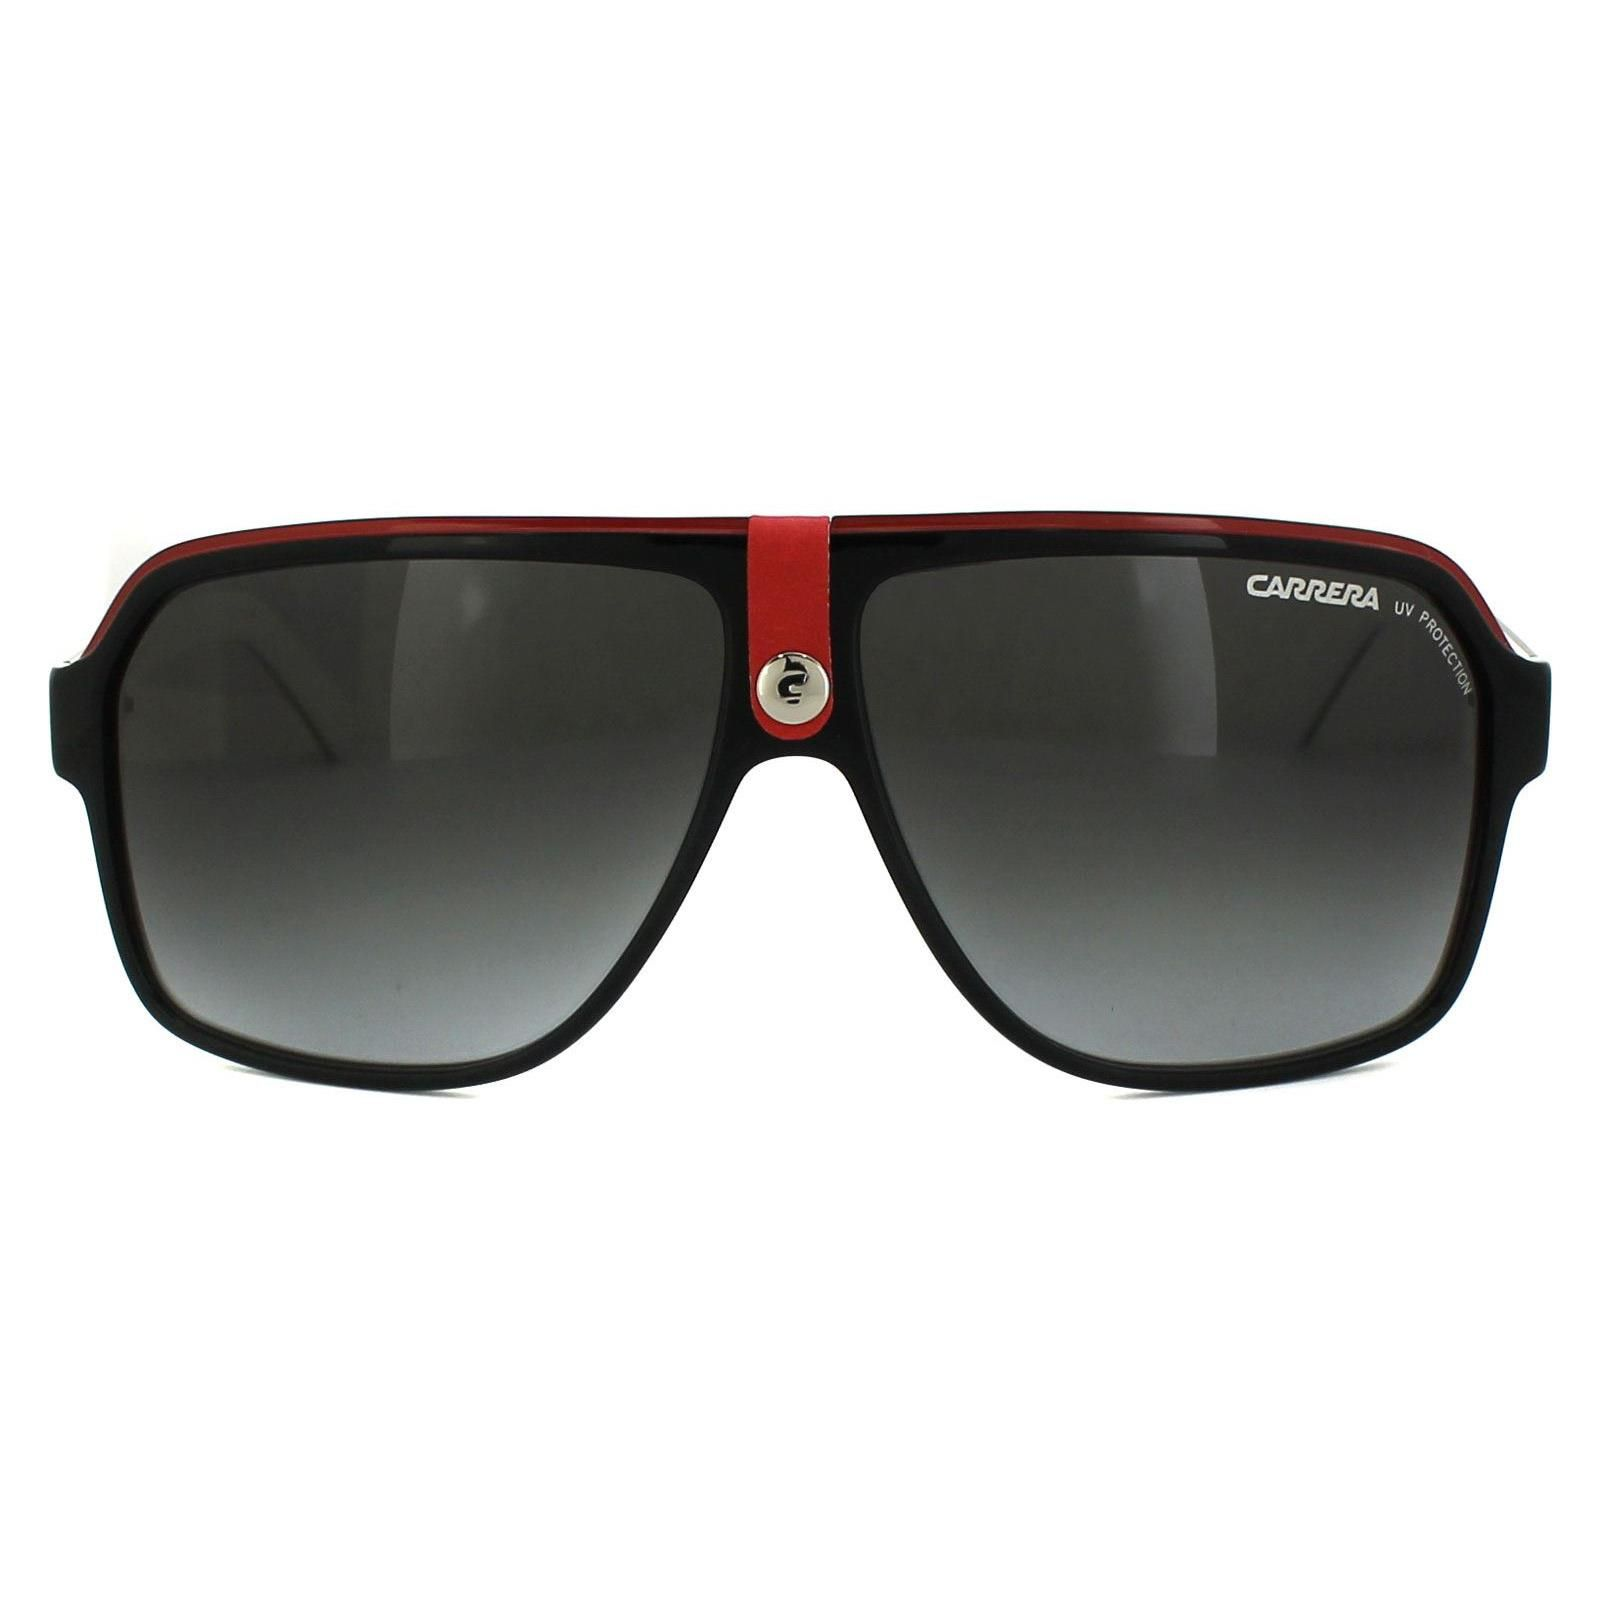 Carrera Sunglasses Carrera 33 8V4 PT Black & White Black Gradient